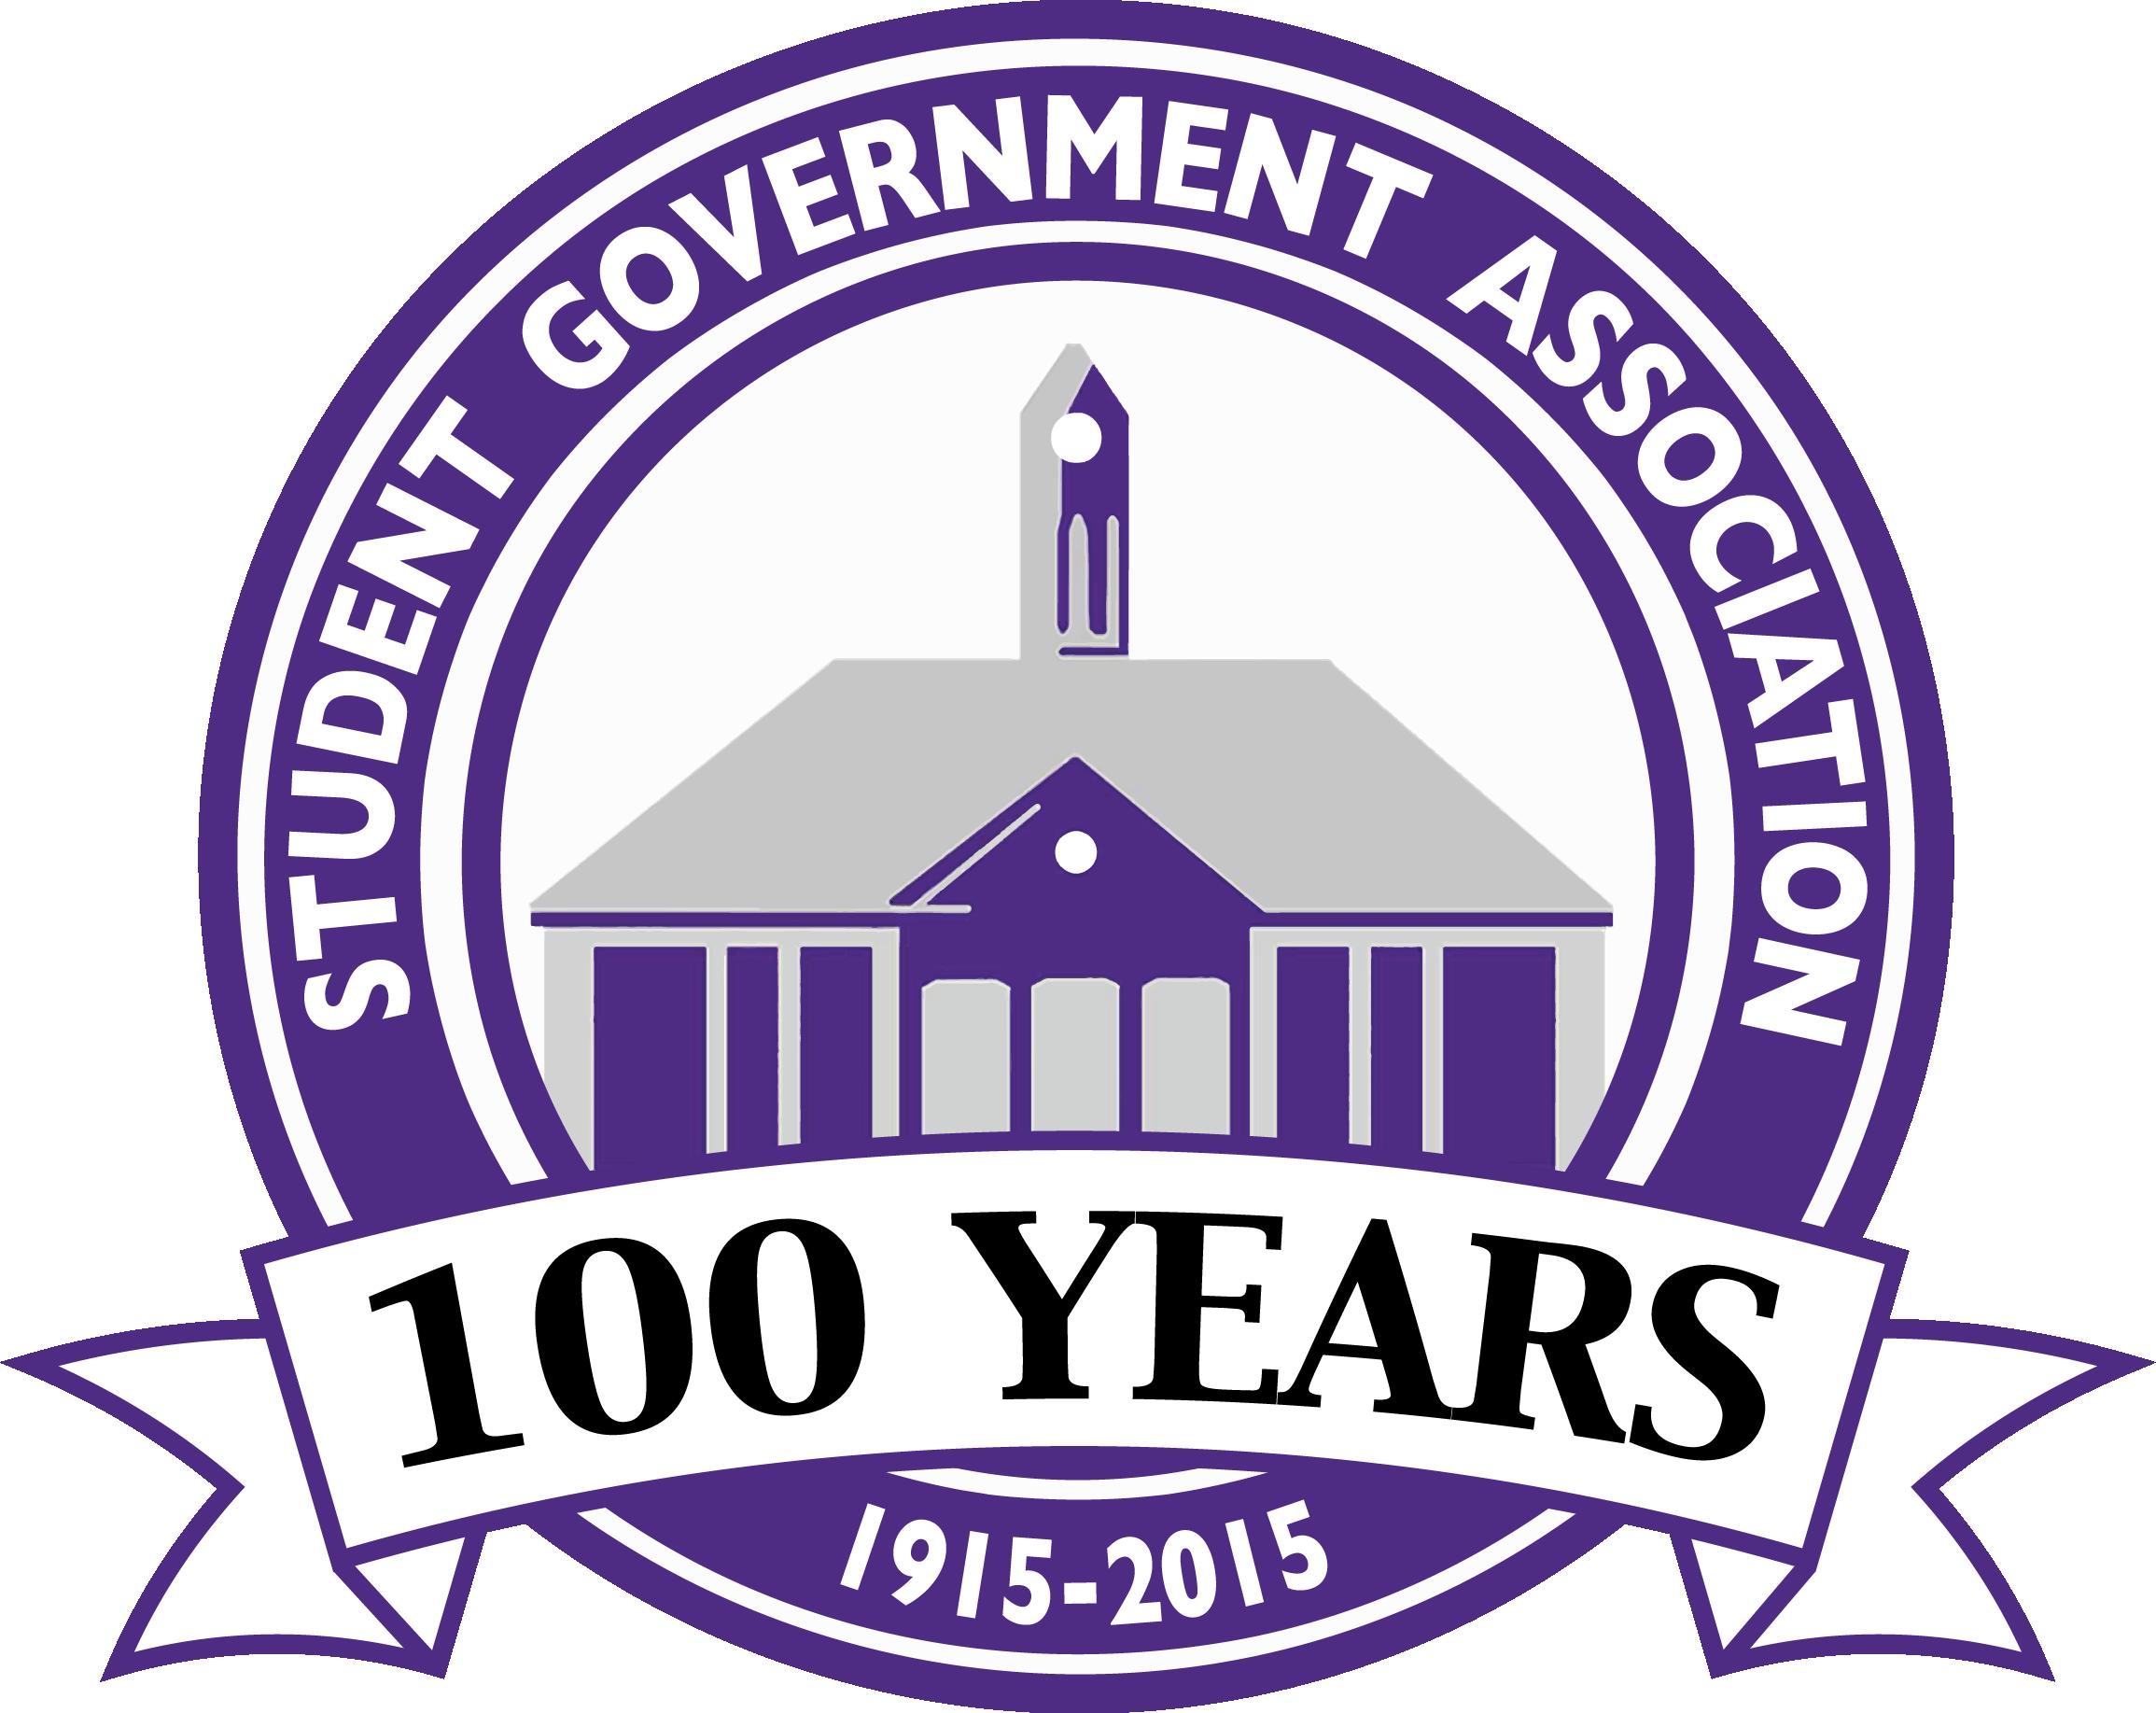 Government clipart student council. Association james madison university